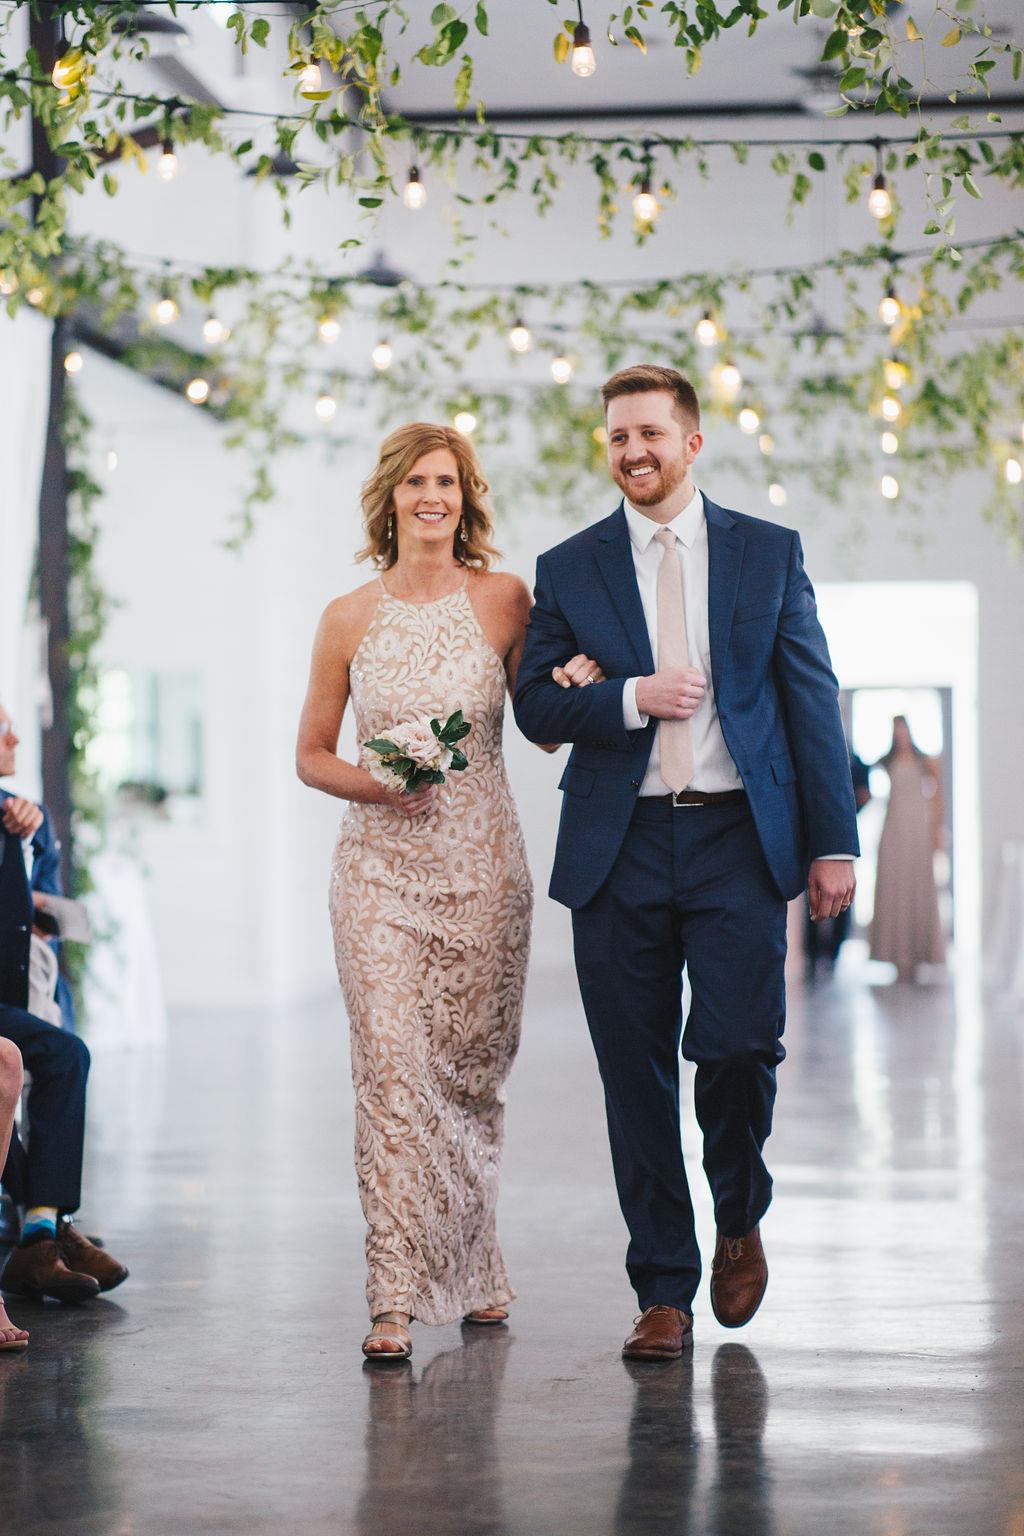 Bixby White Barn Tulsa Wedding 52.jpg